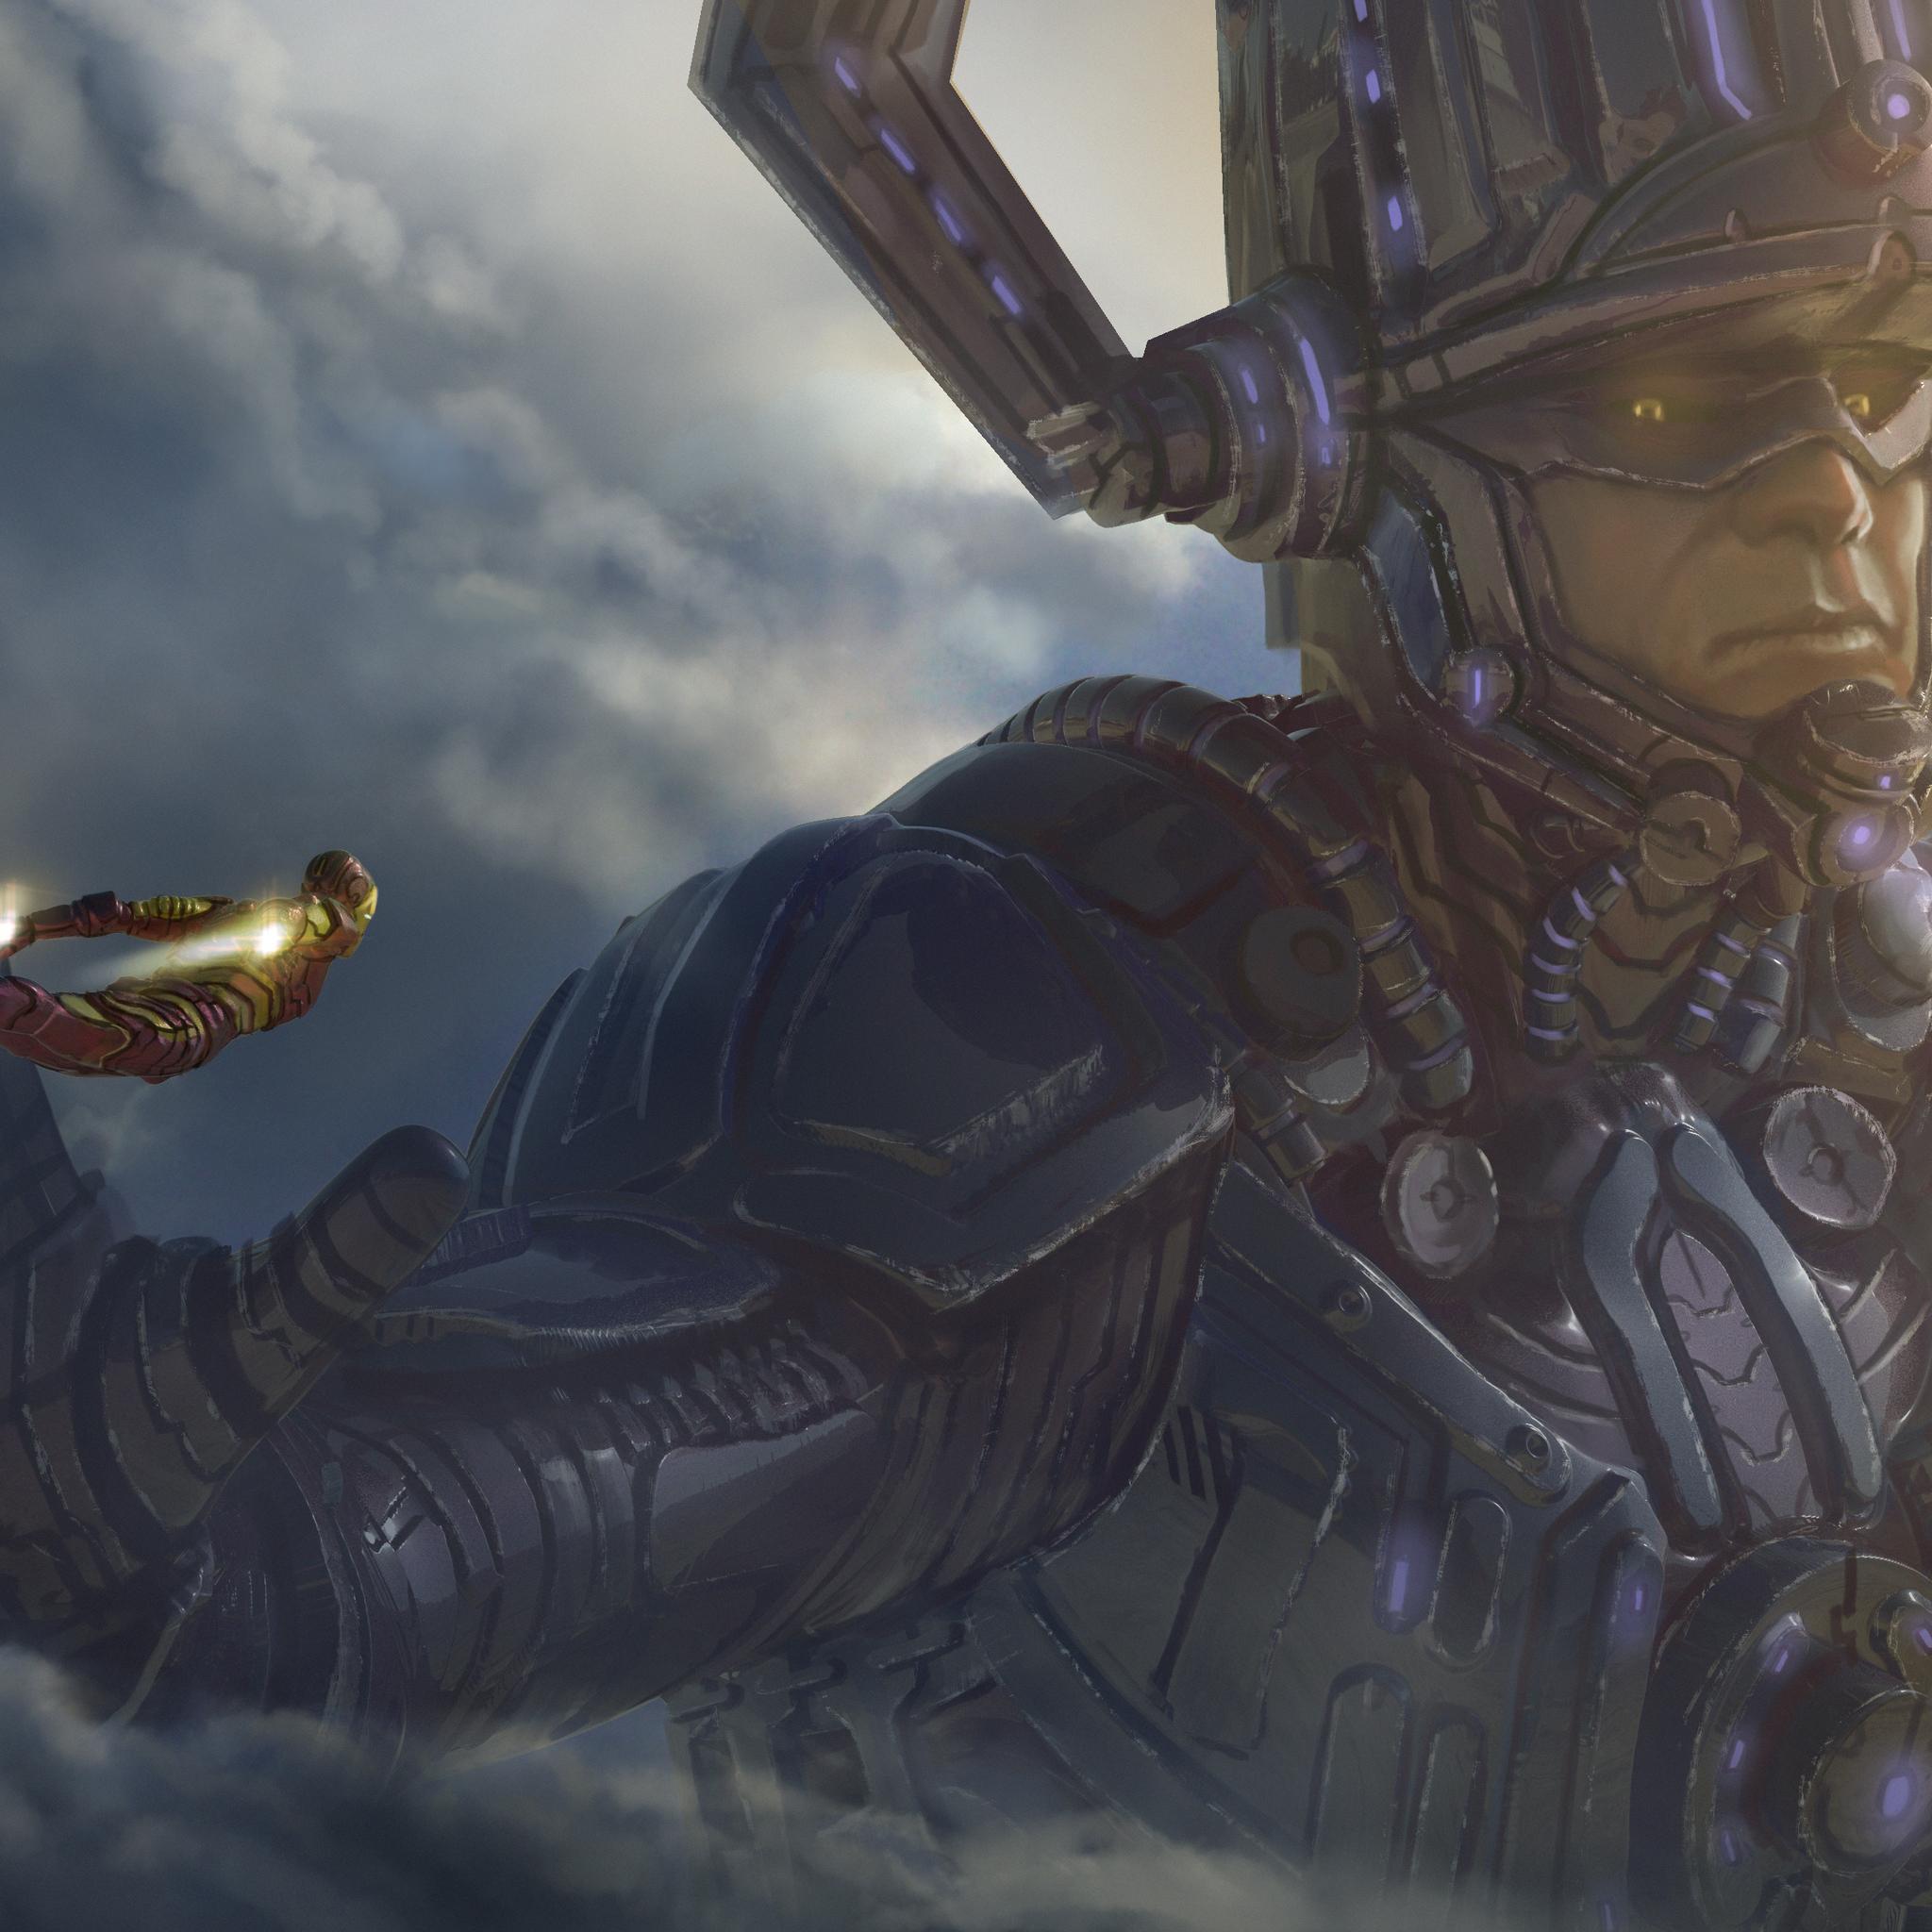 galactus-vs-iron-man-avengers-4-concept-art-p6.jpg